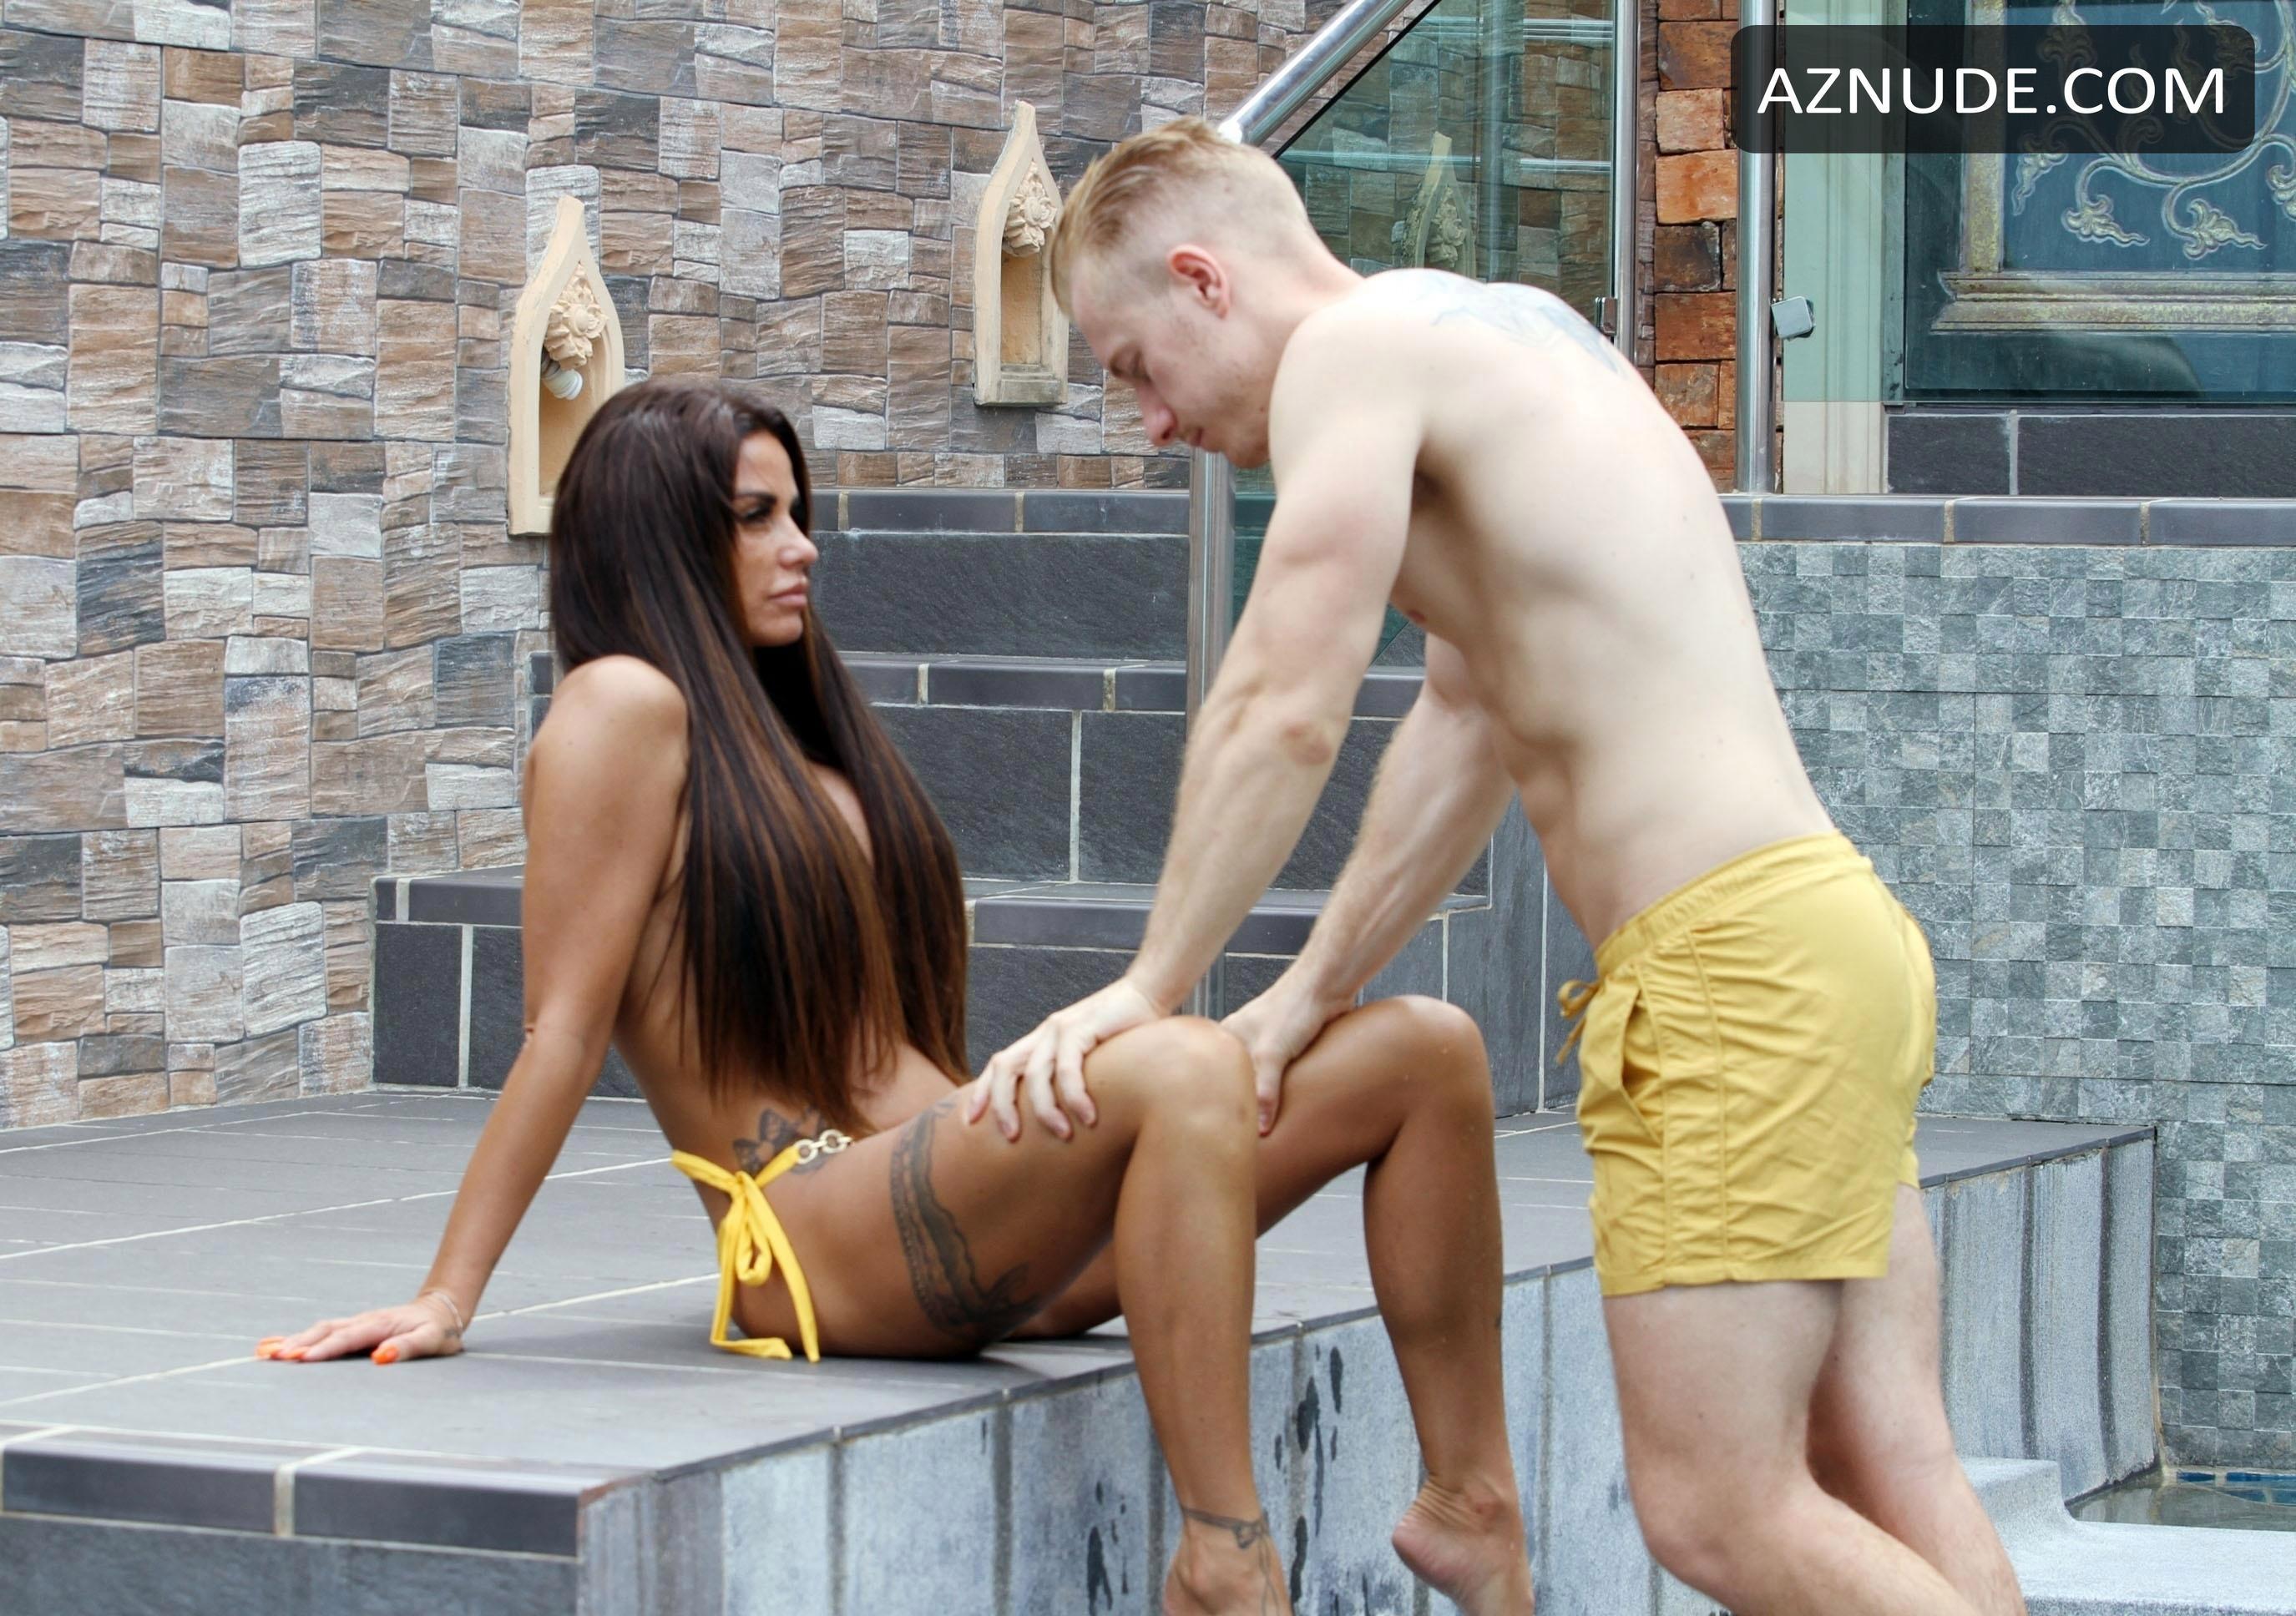 girl pull boy pant nude